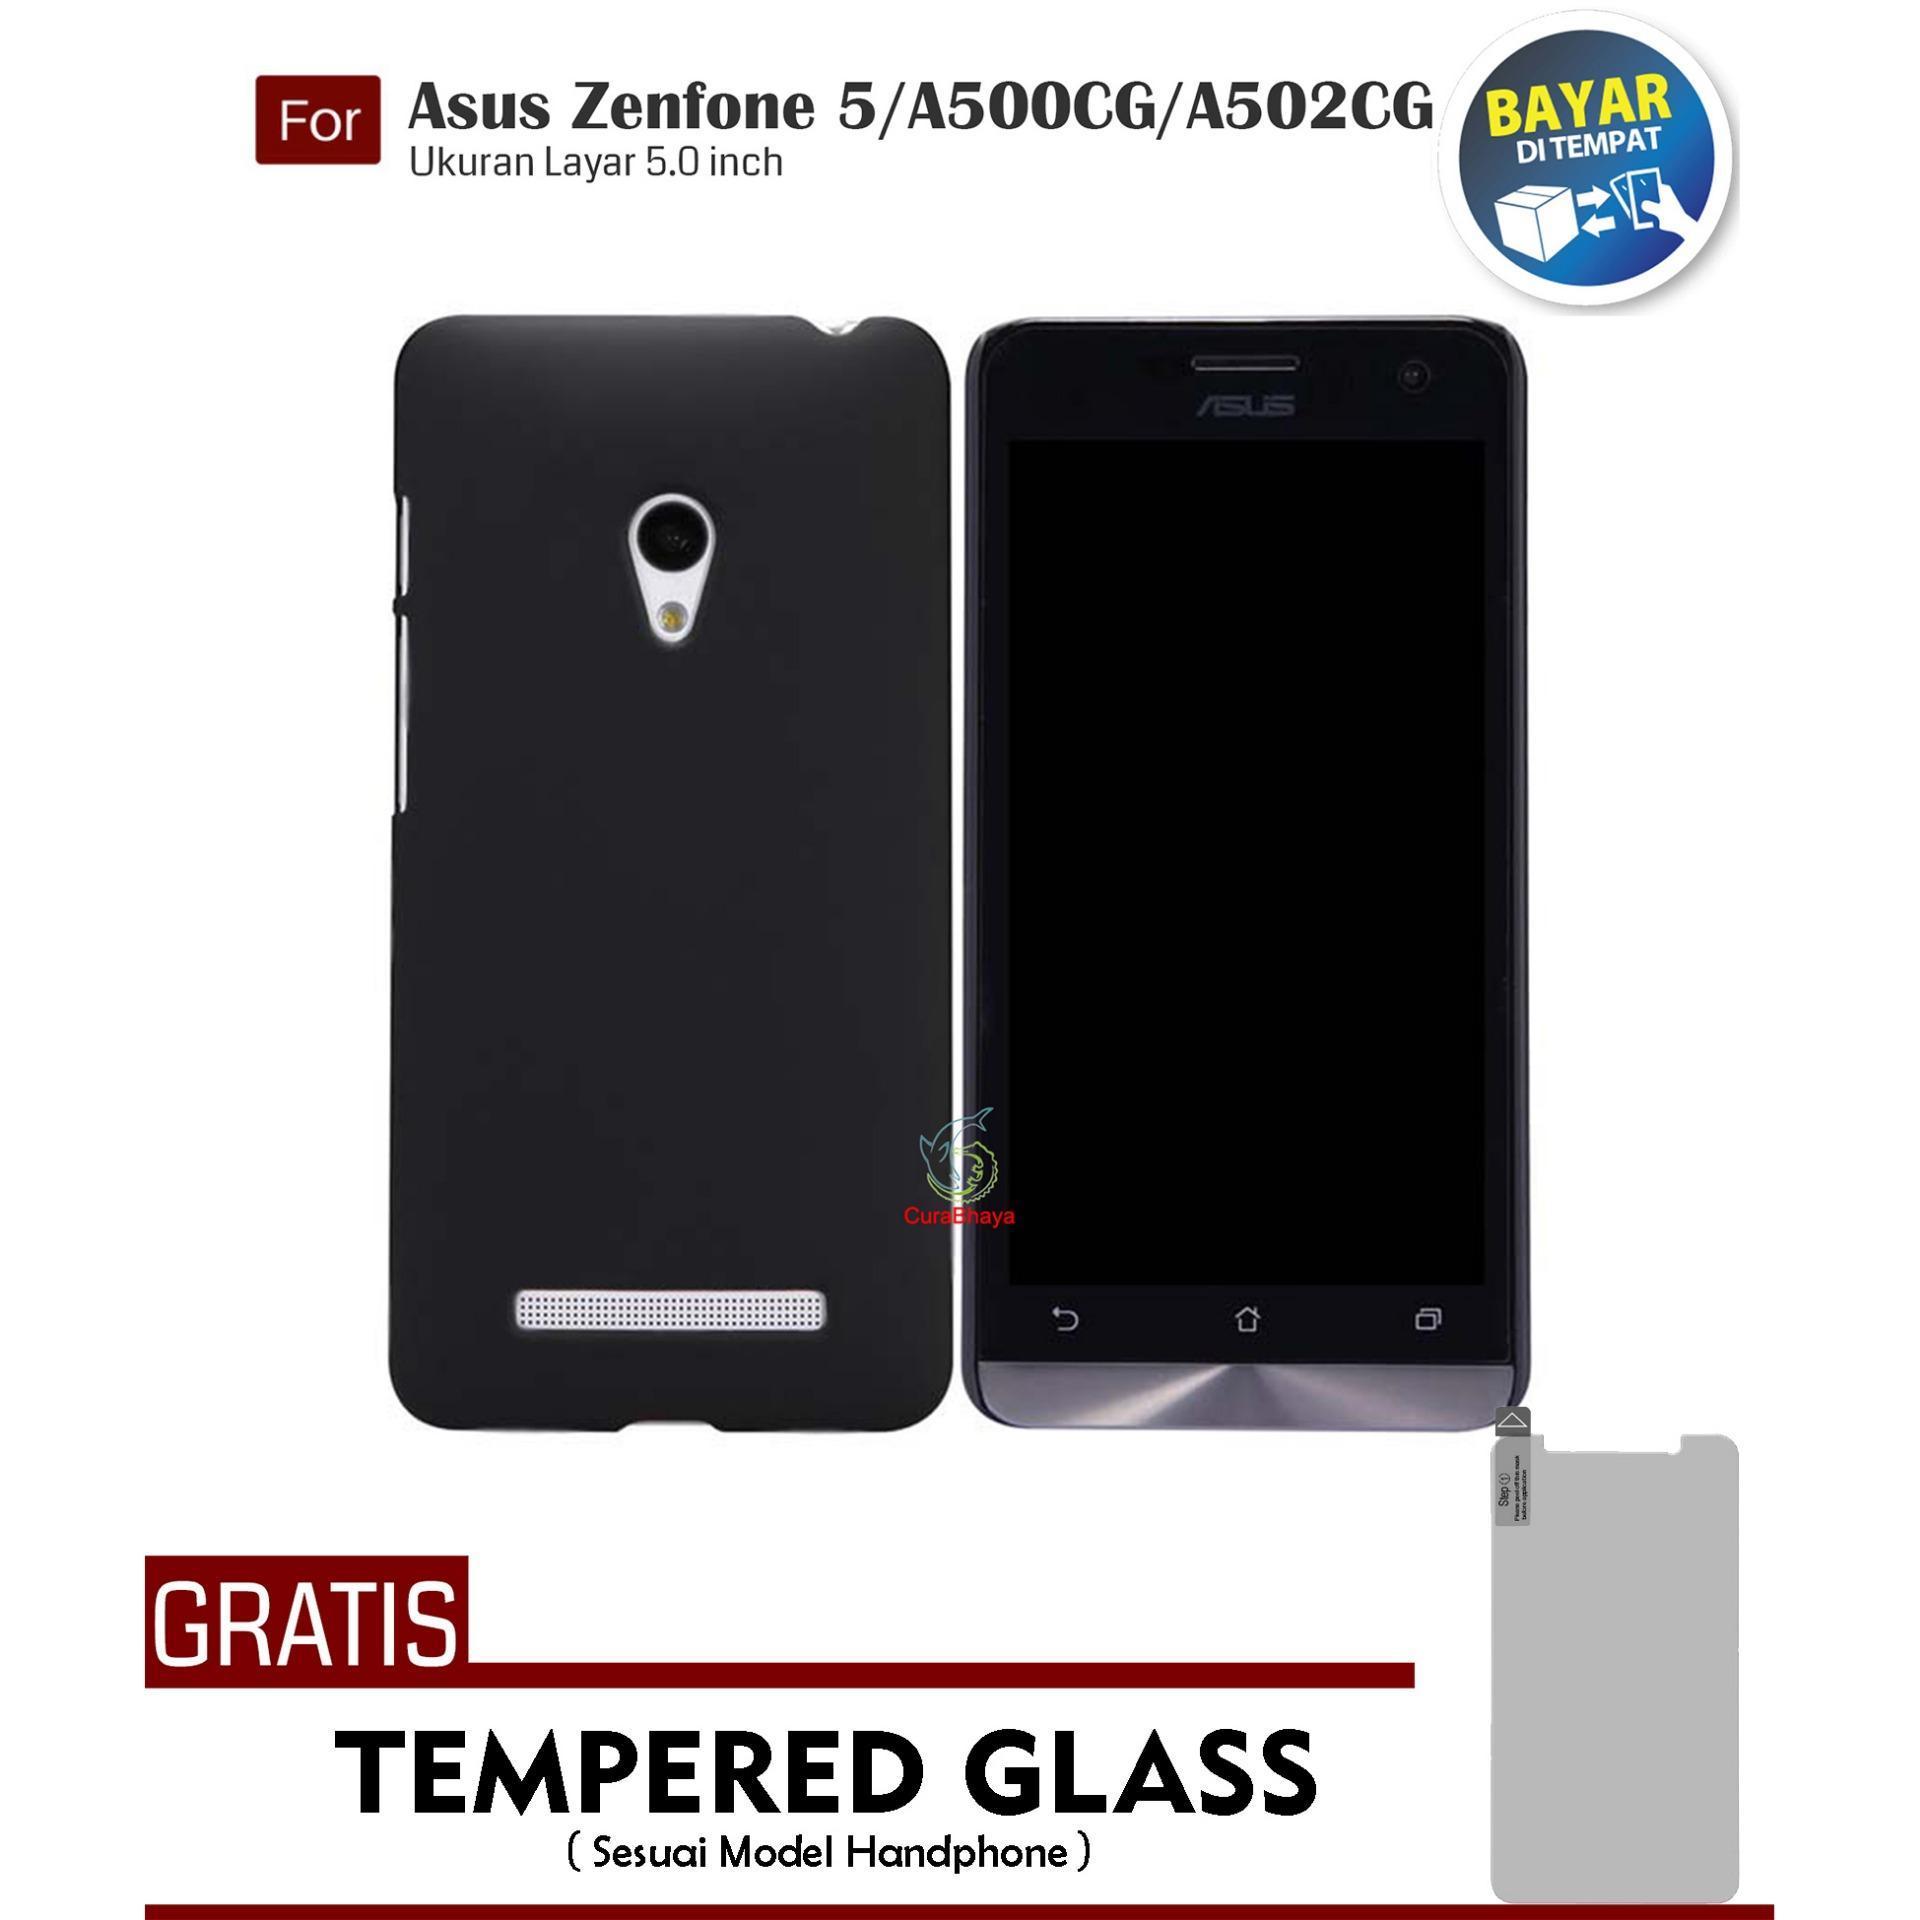 MidNight Asus Zenfone Zenfone 5 / Lite / A500CG / A502CG    Slim Case Black Matte Softcase Premium Baby Skin + Gratis Free Tempered Glass Screen Protector